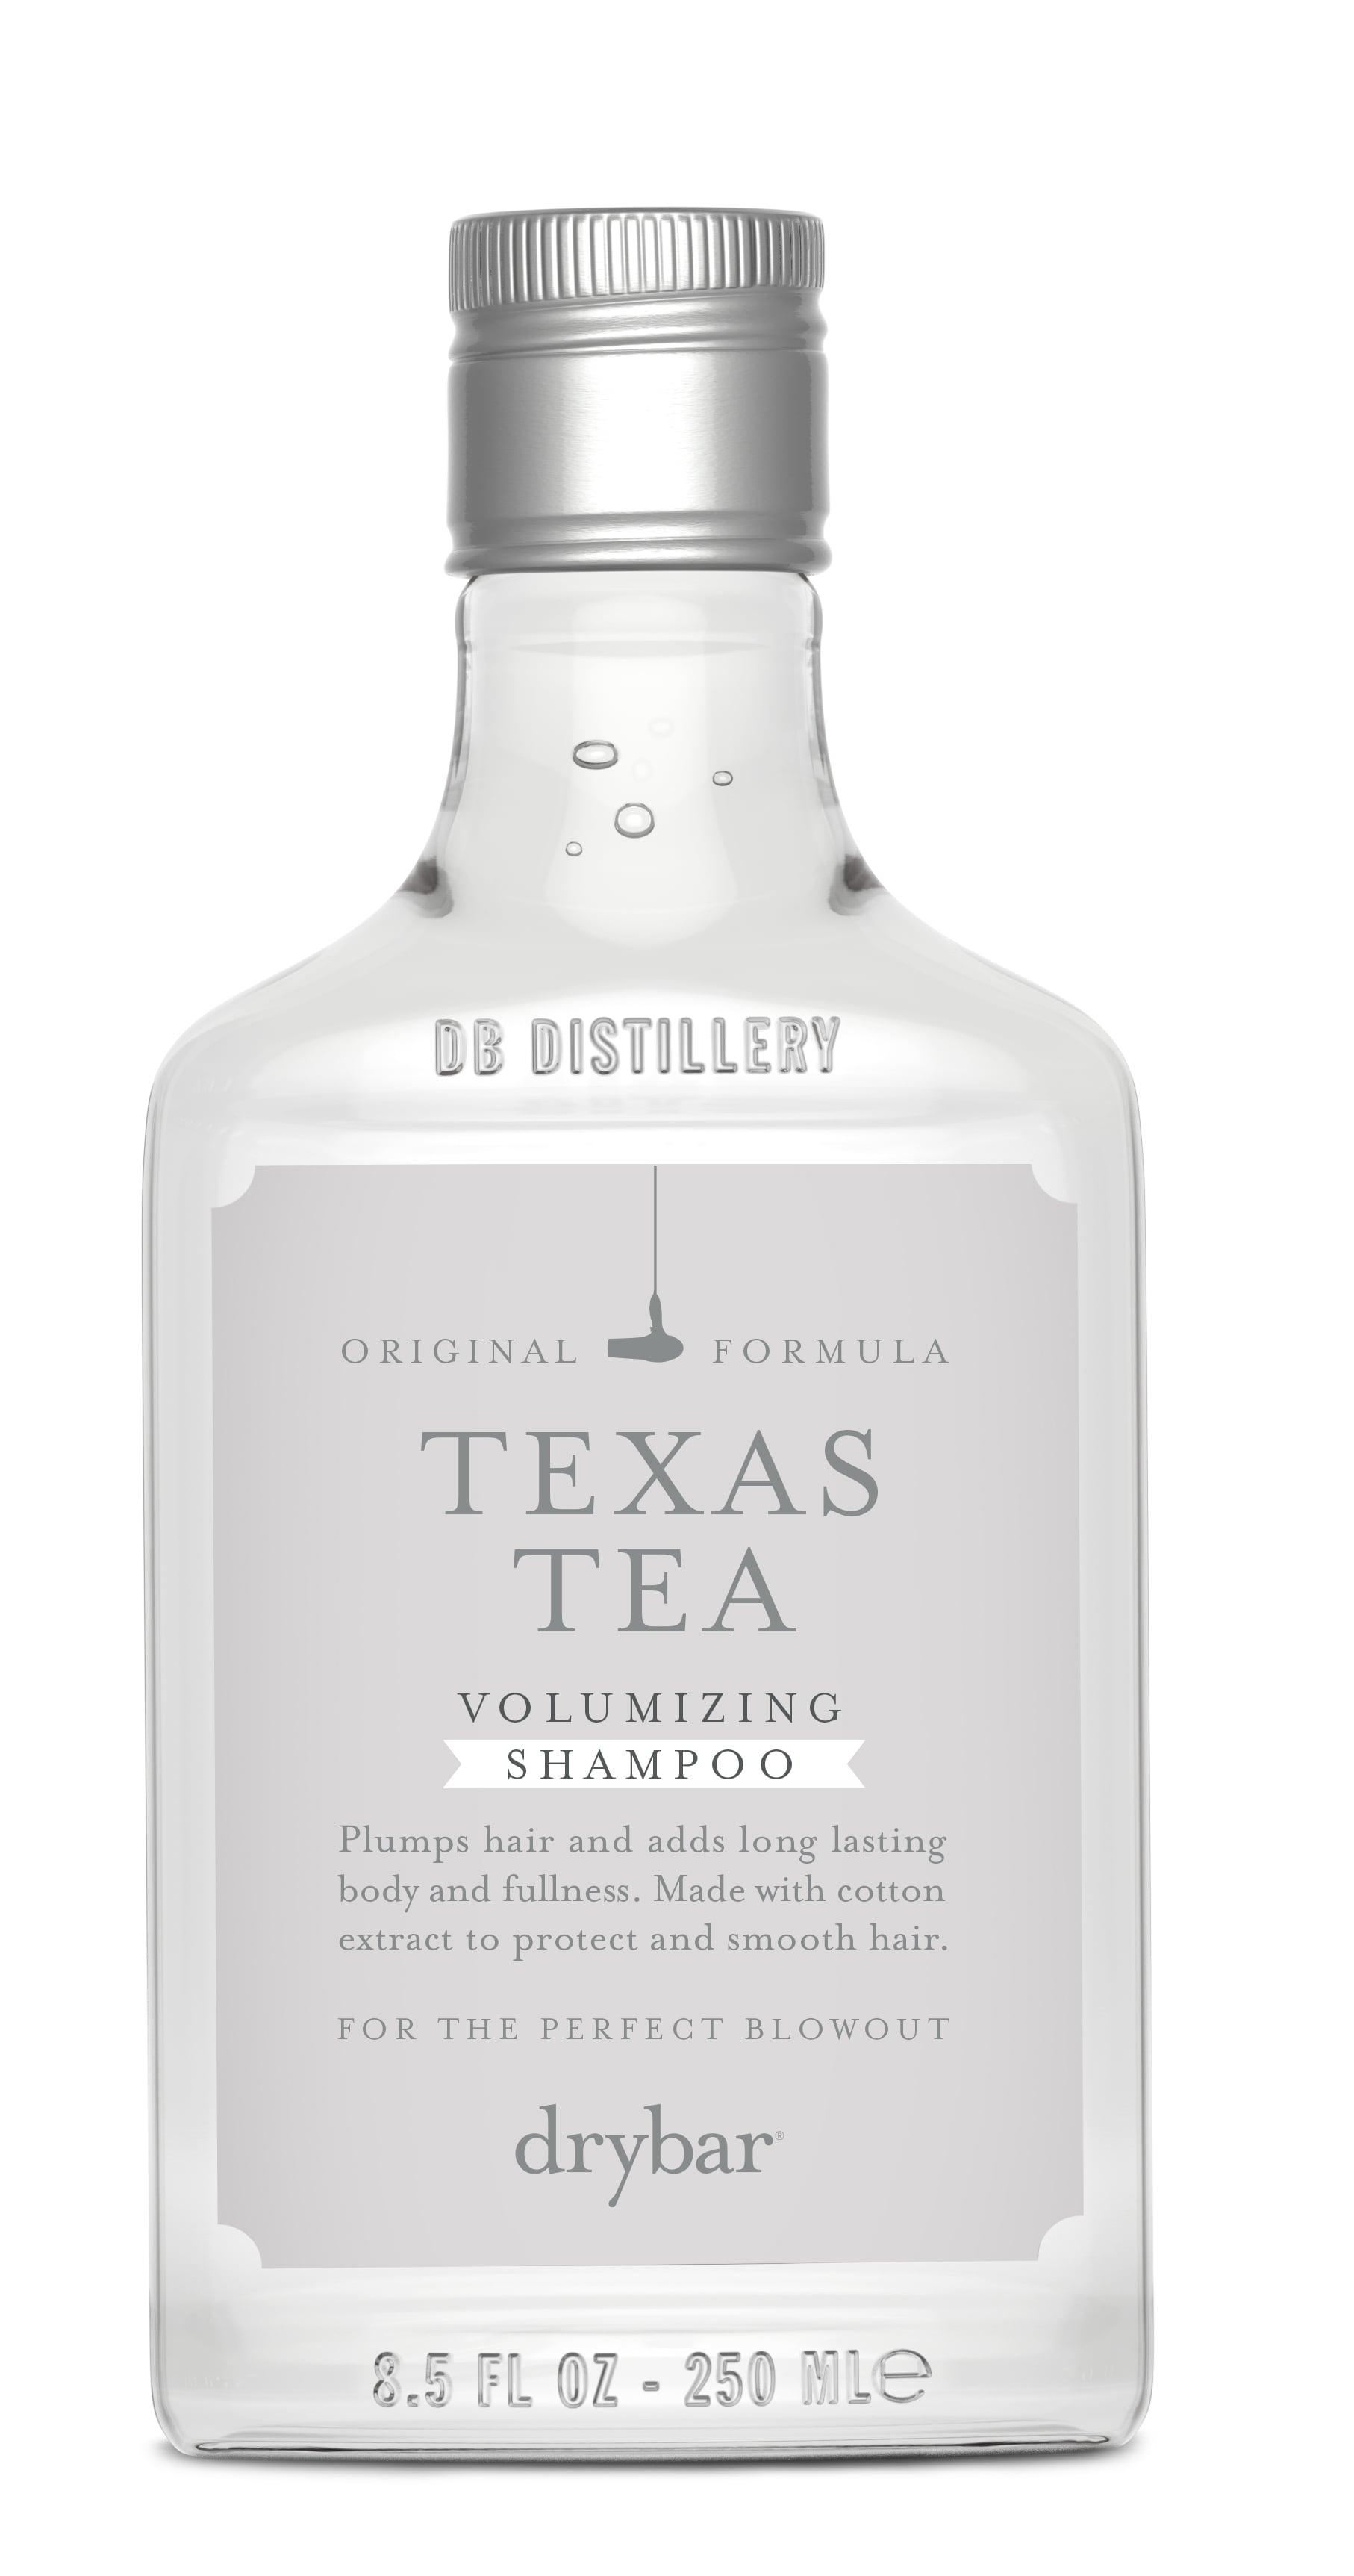 Drybar Texas Tea Volumizing Shampoo